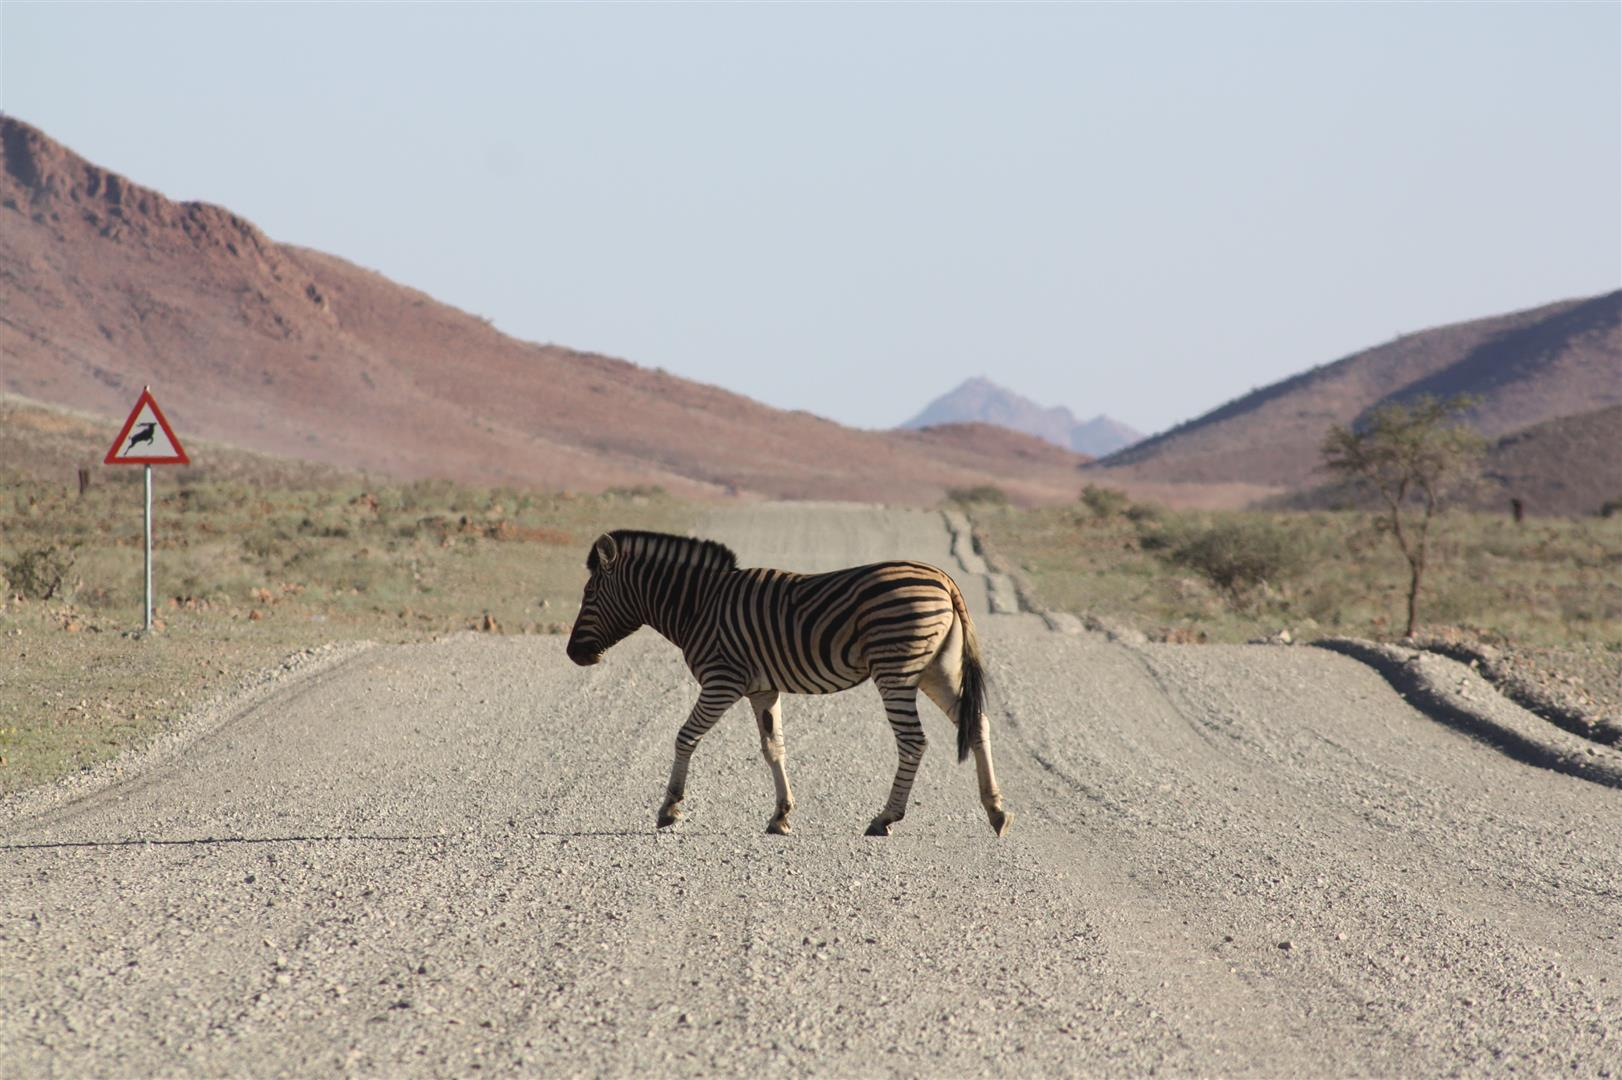 An actual zebra crossing